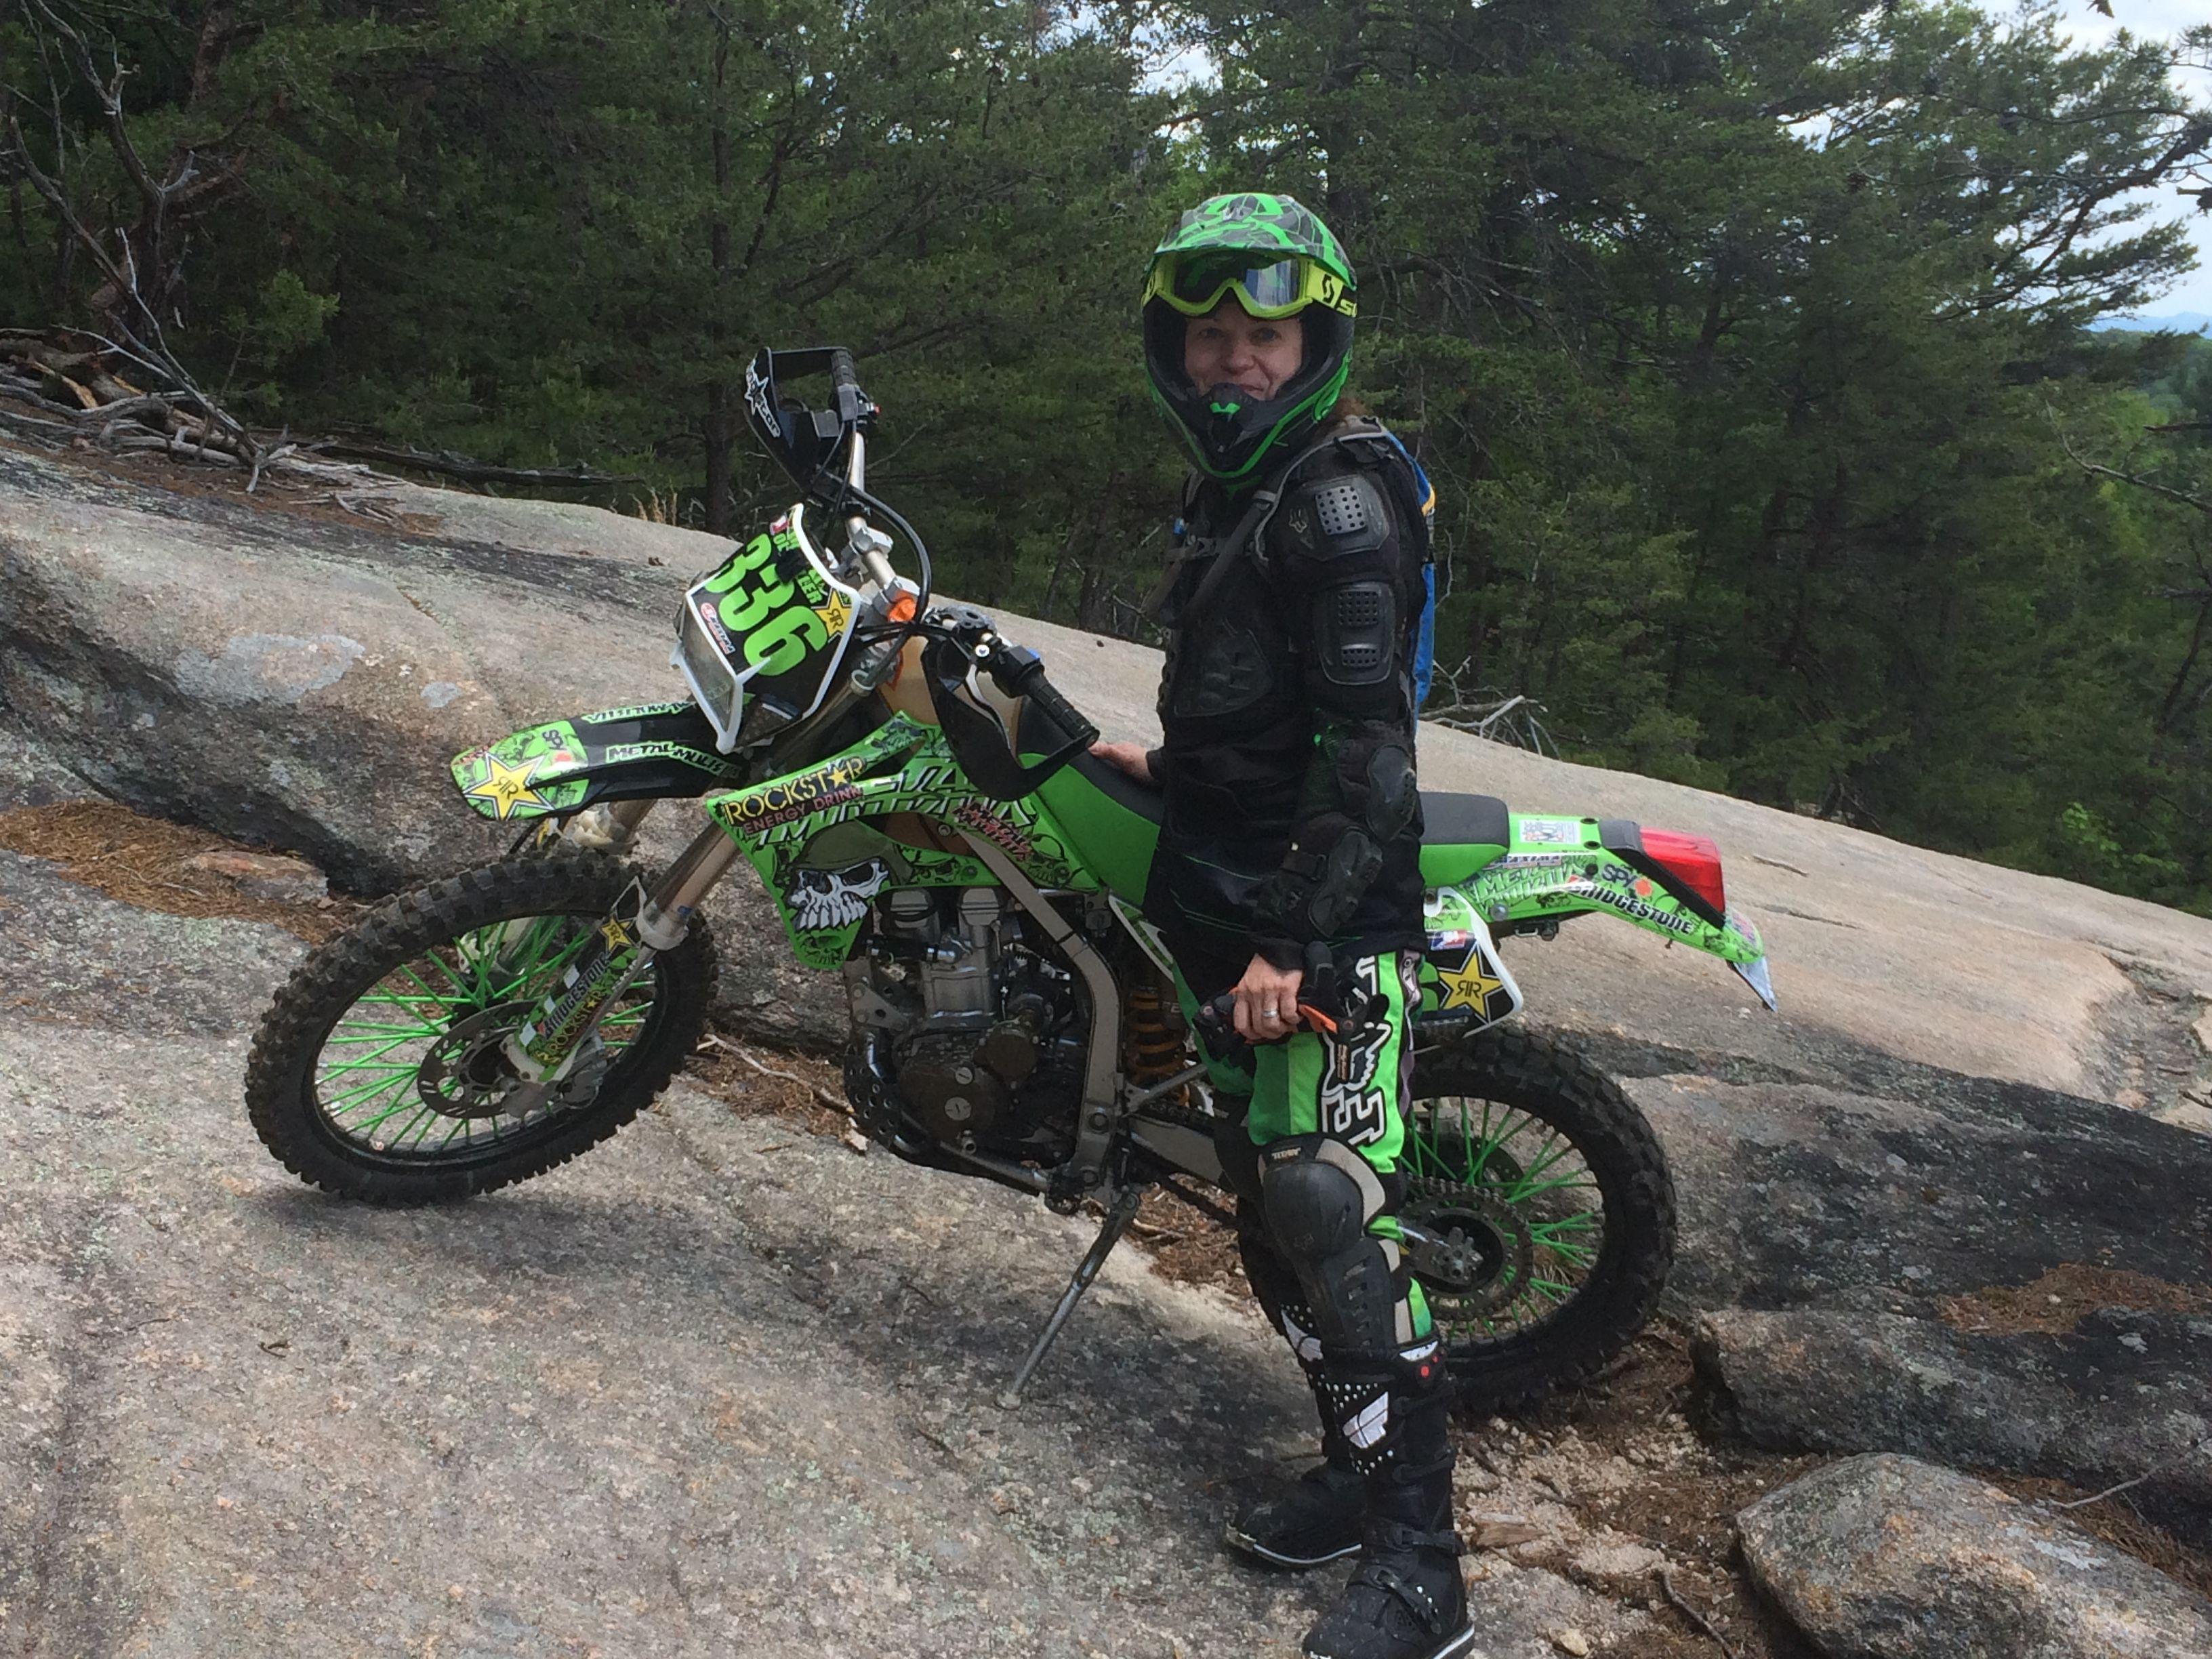 Klx 250s Dirtbikes Vehicles Moped